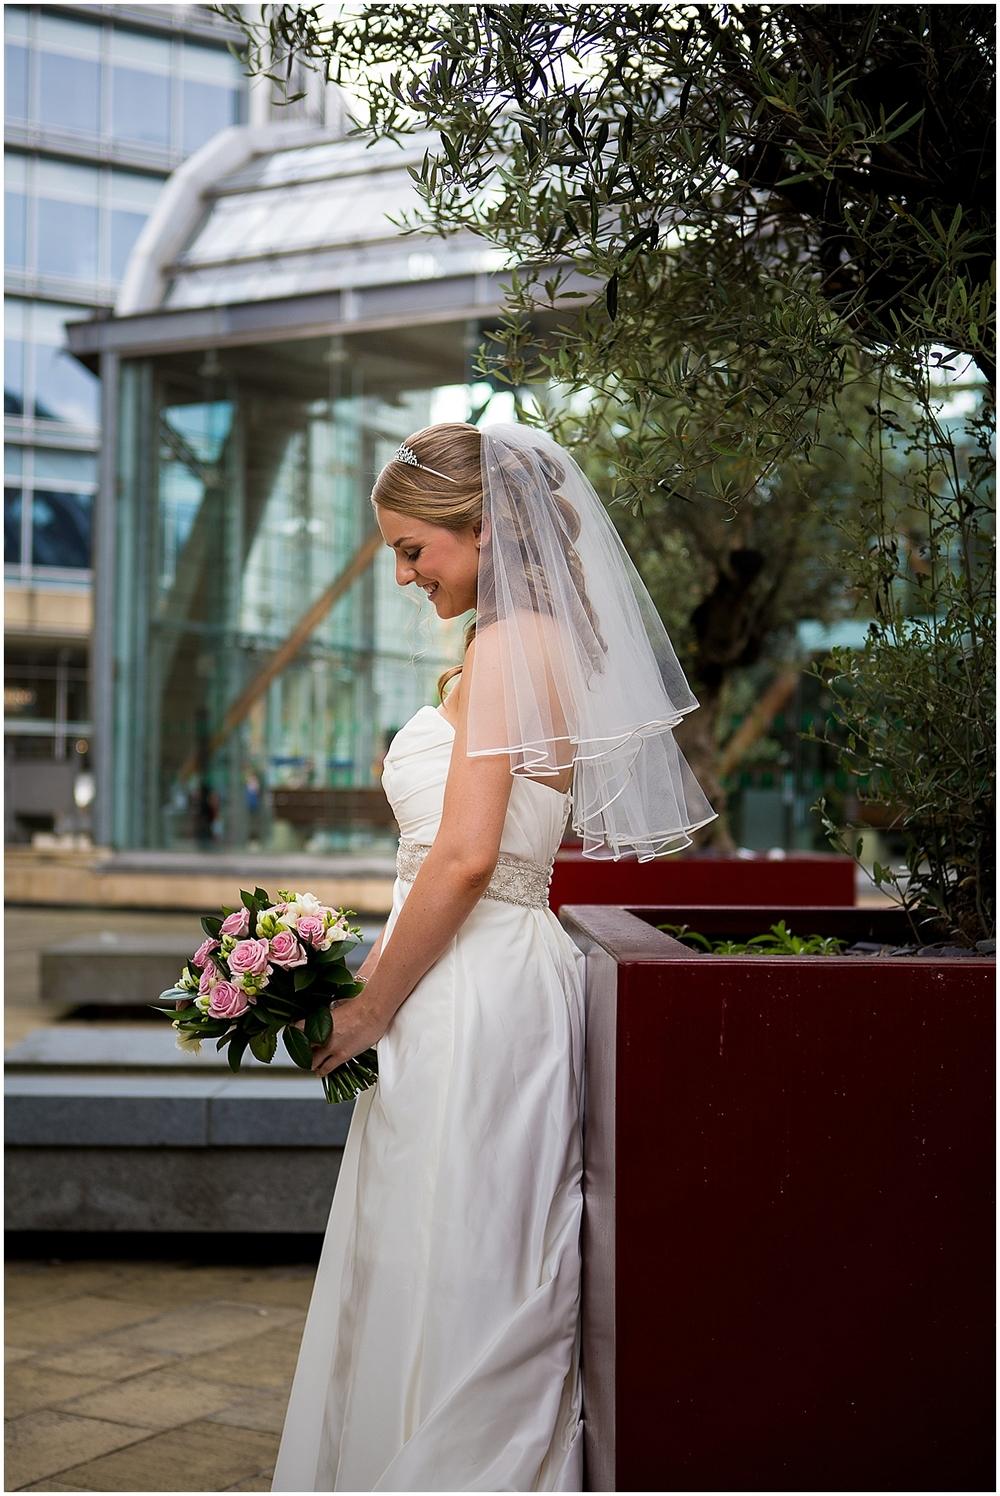 Jon-Cripwell-Sheffield-Wedding-Photography_0014.jpg